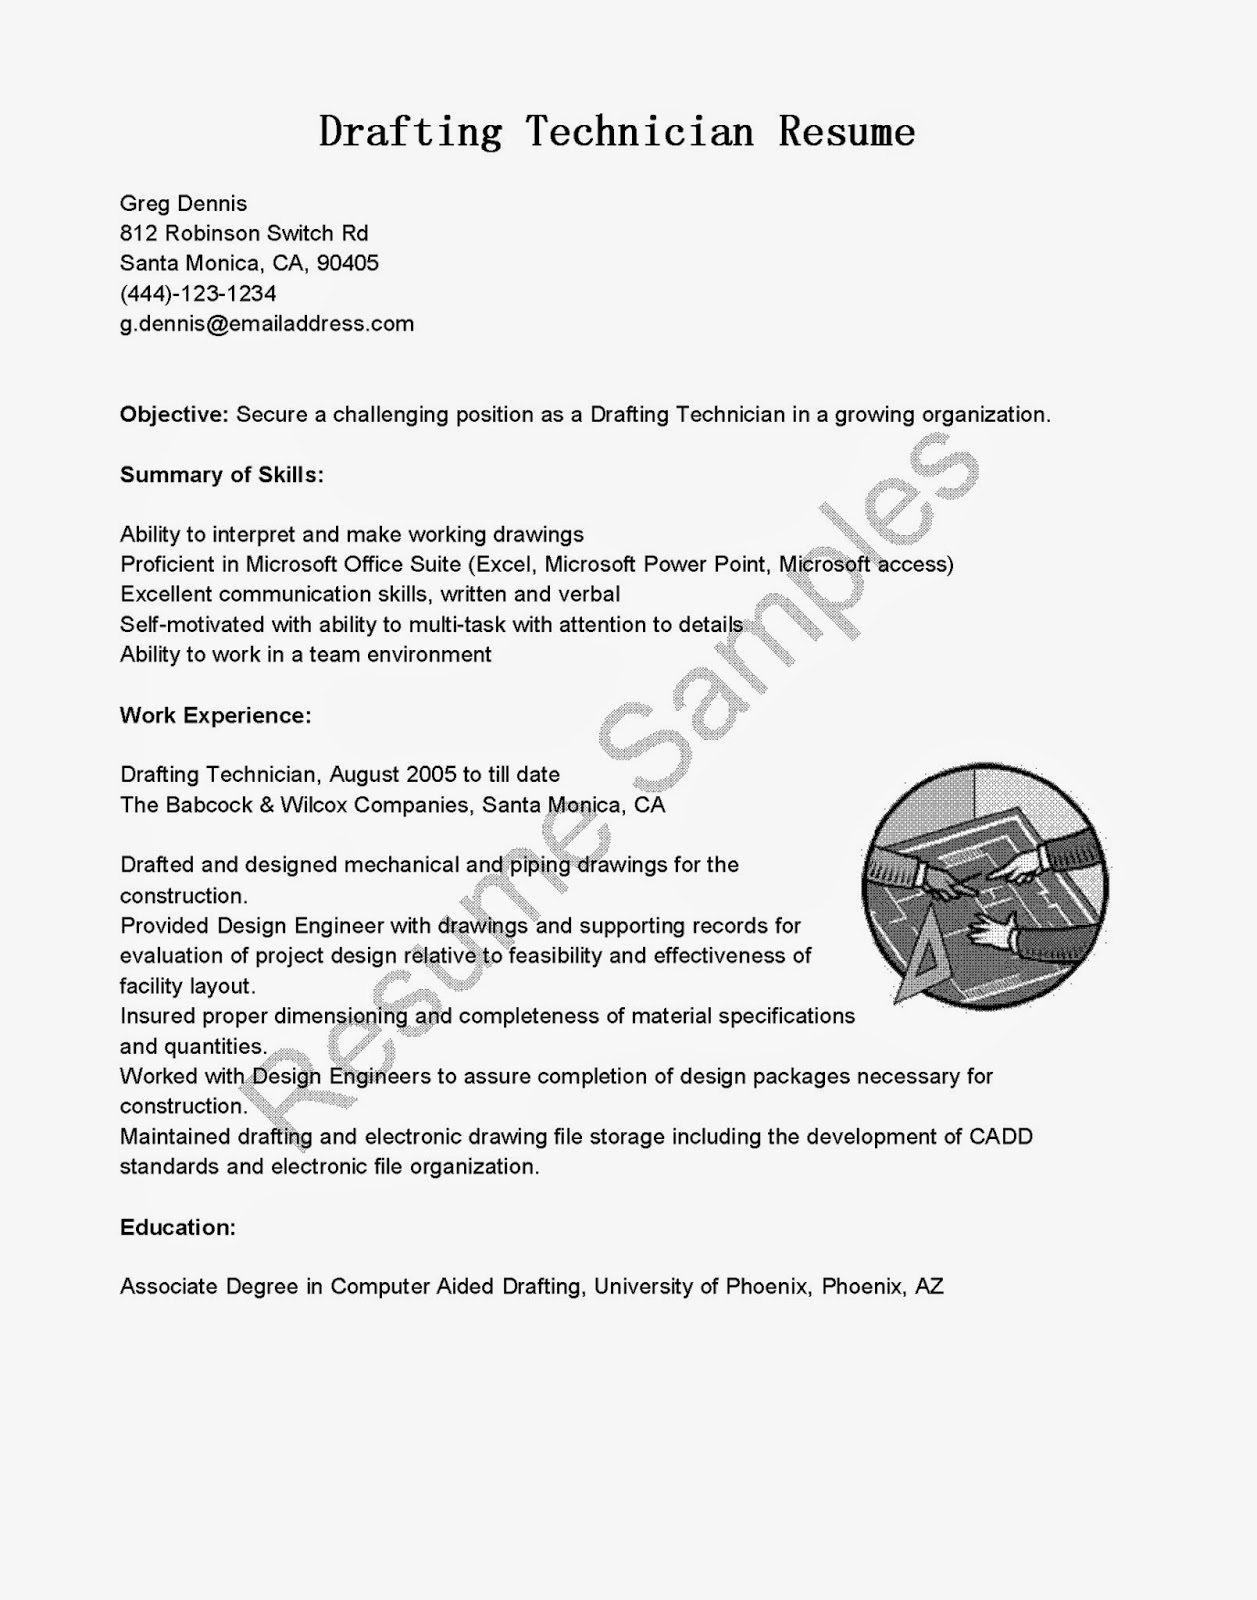 resume samples drafting technician resume sample